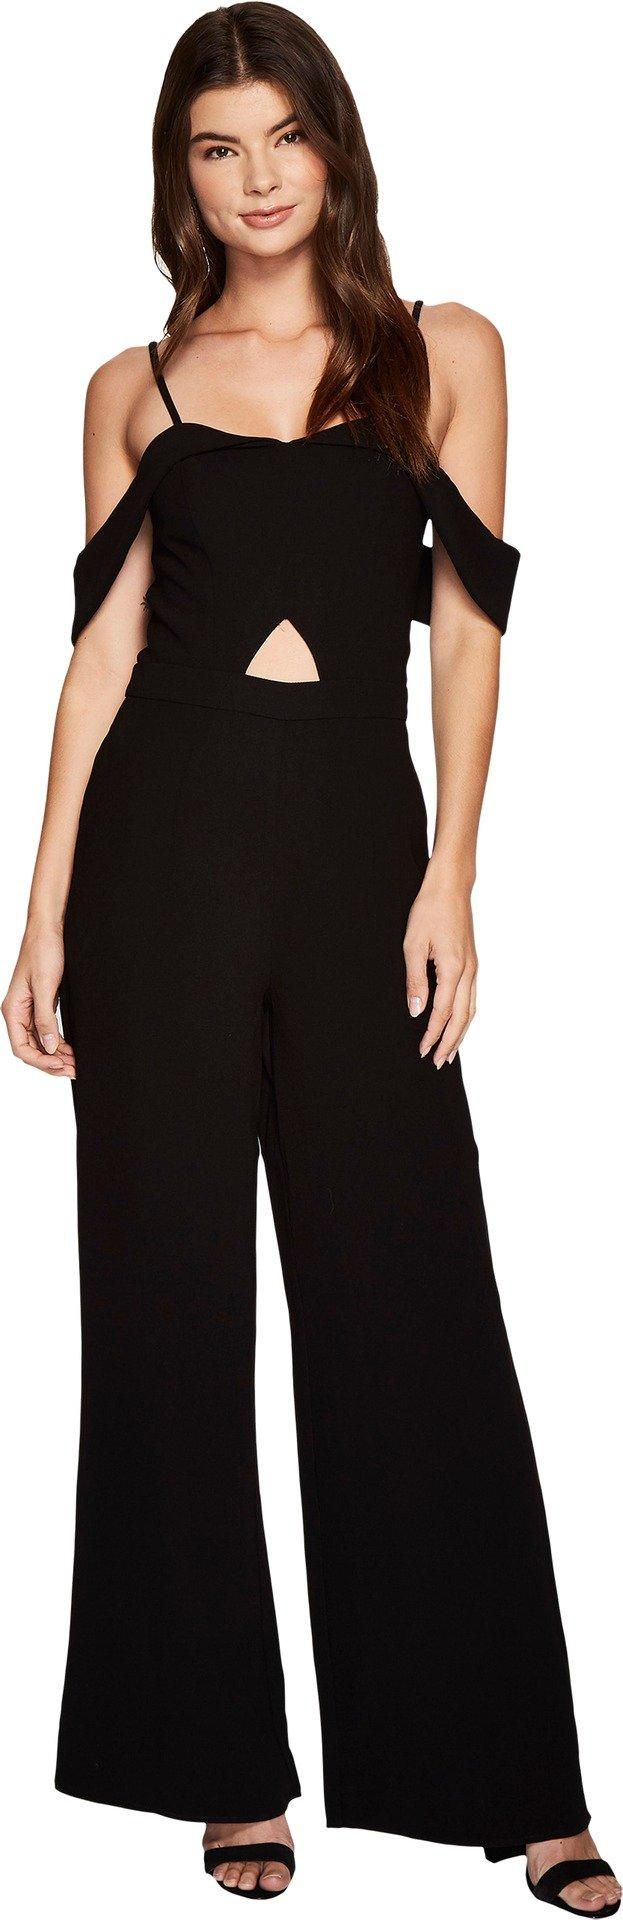 J.O.A. Women's Cut Out Jumpsuit Black X-Small